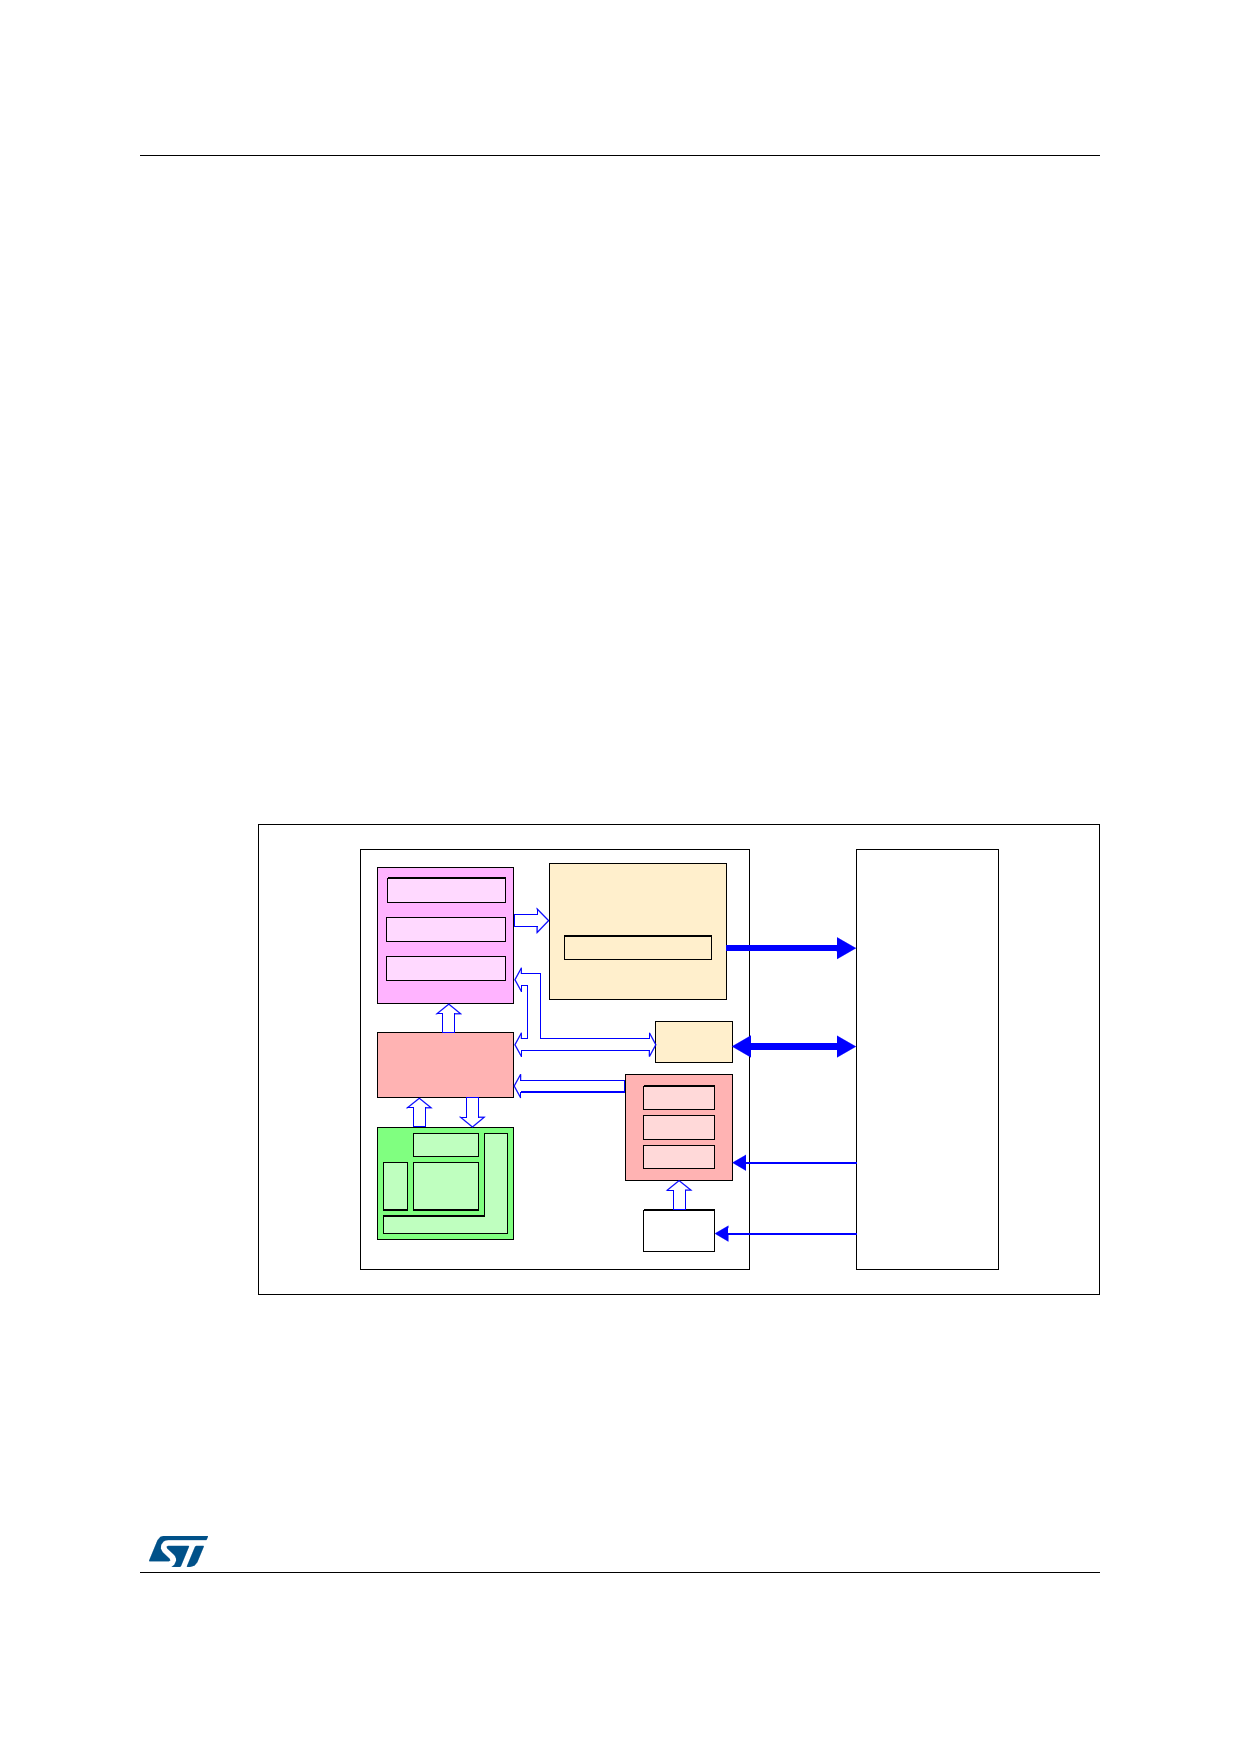 VS6663CD diode, scr